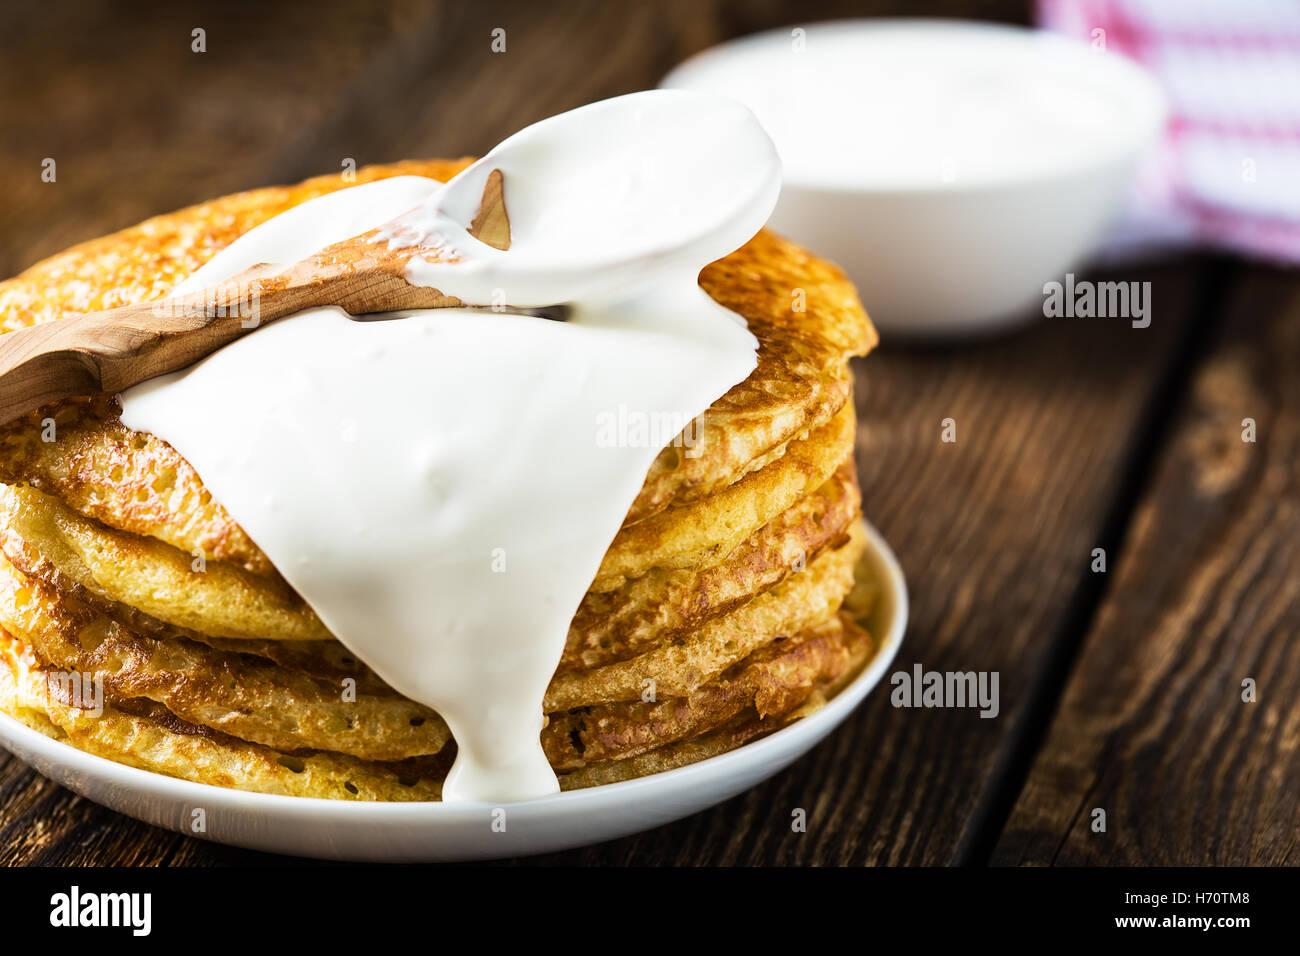 Pancakes on sour cream